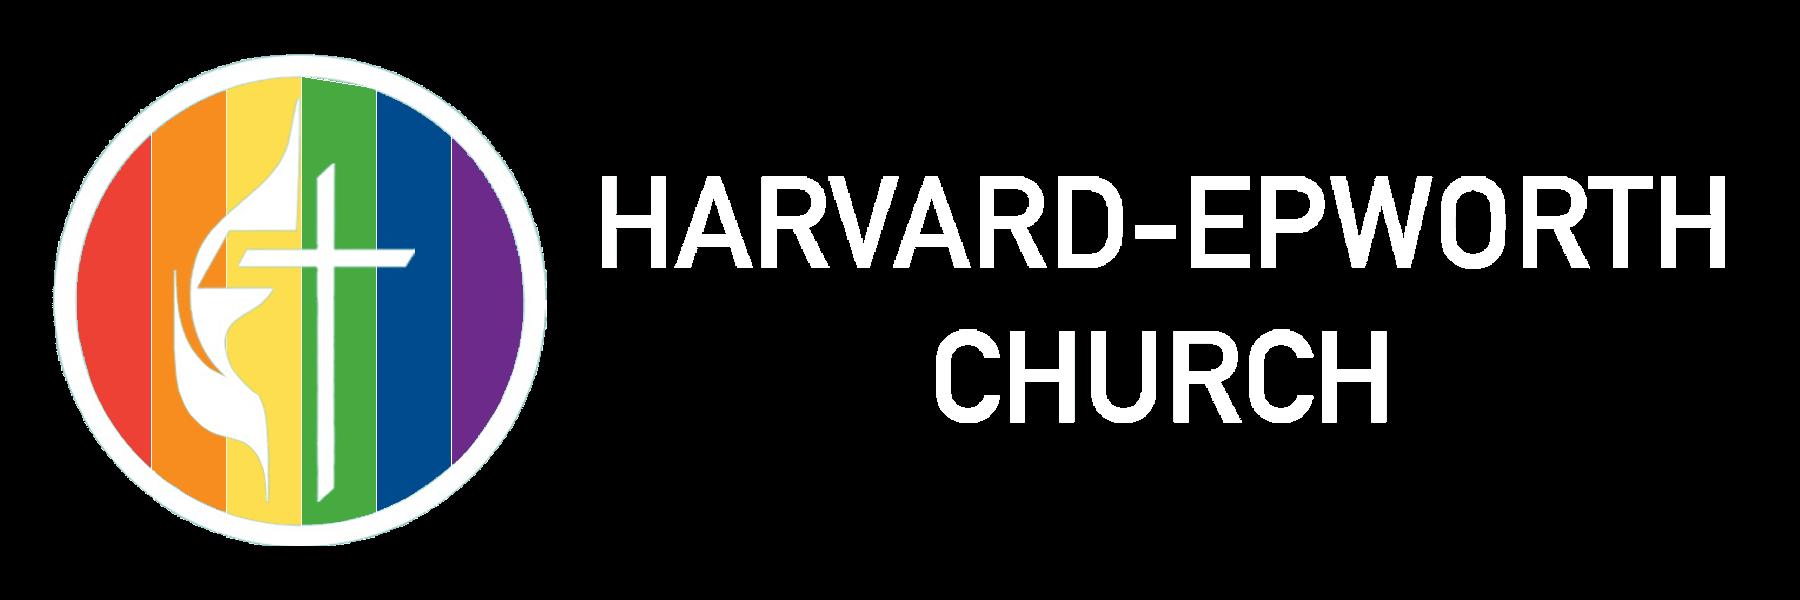 Harvard-Epworth Church